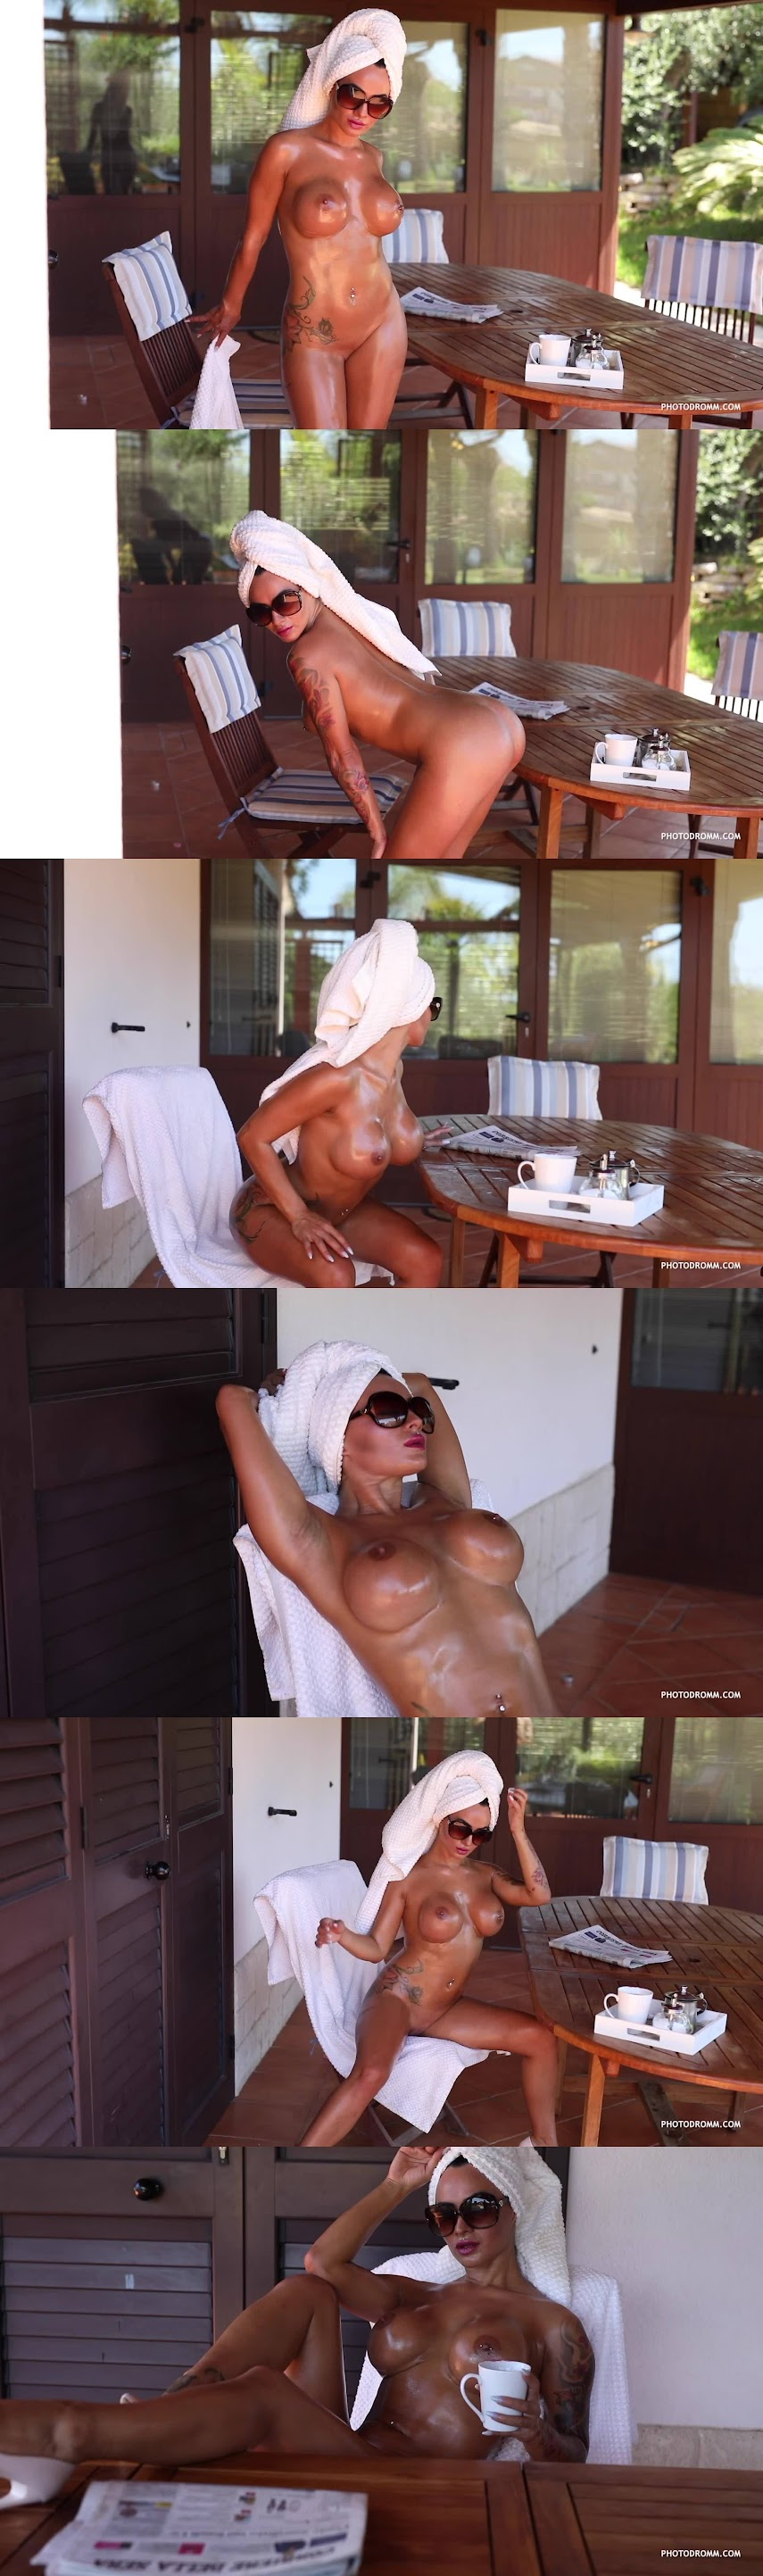 [PhotoDromm] Trudy - Breakfast Club - Girlsdelta